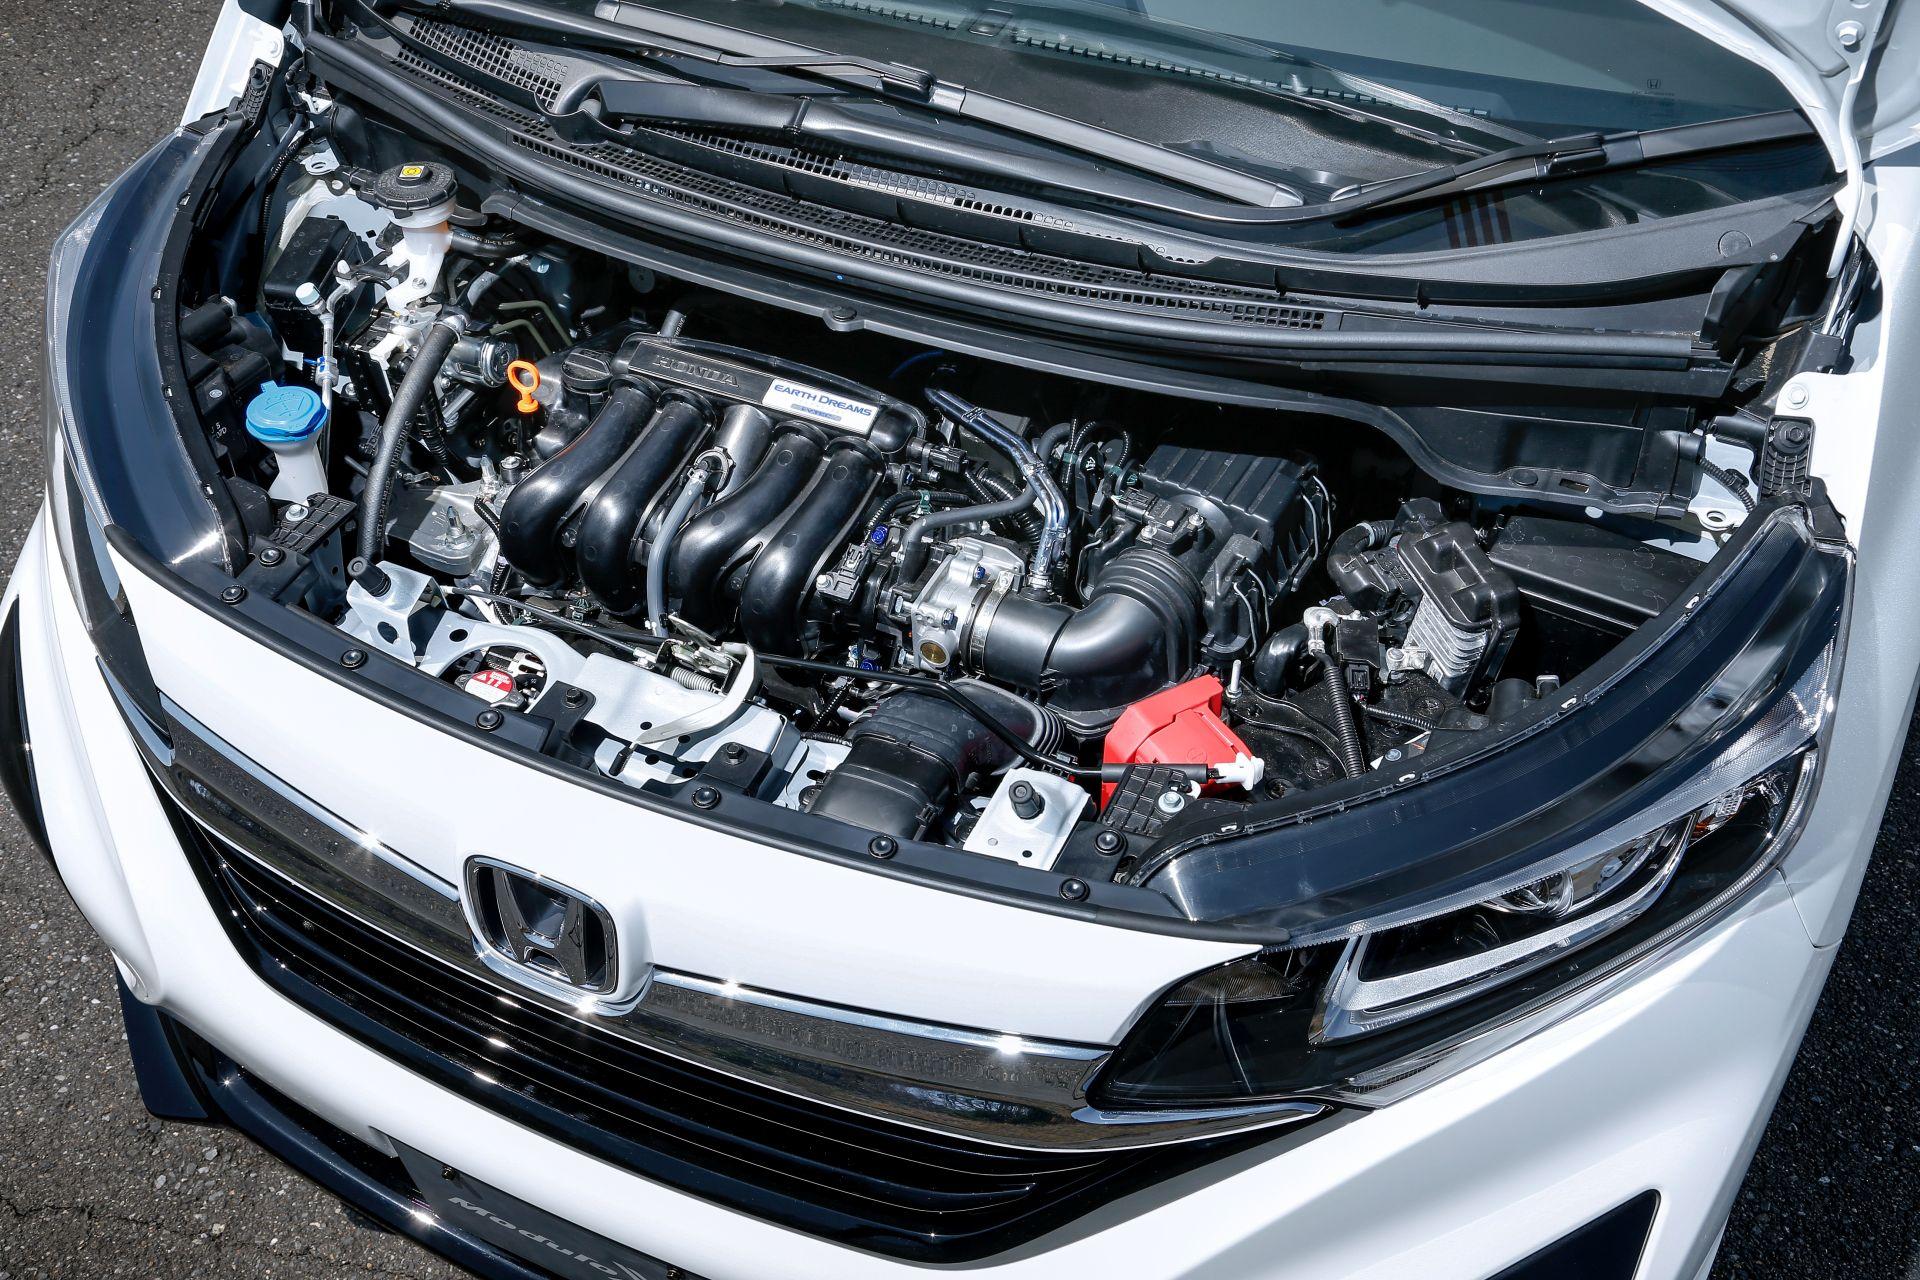 Honda-Freed-Modulo-X-Facelift-2020-9